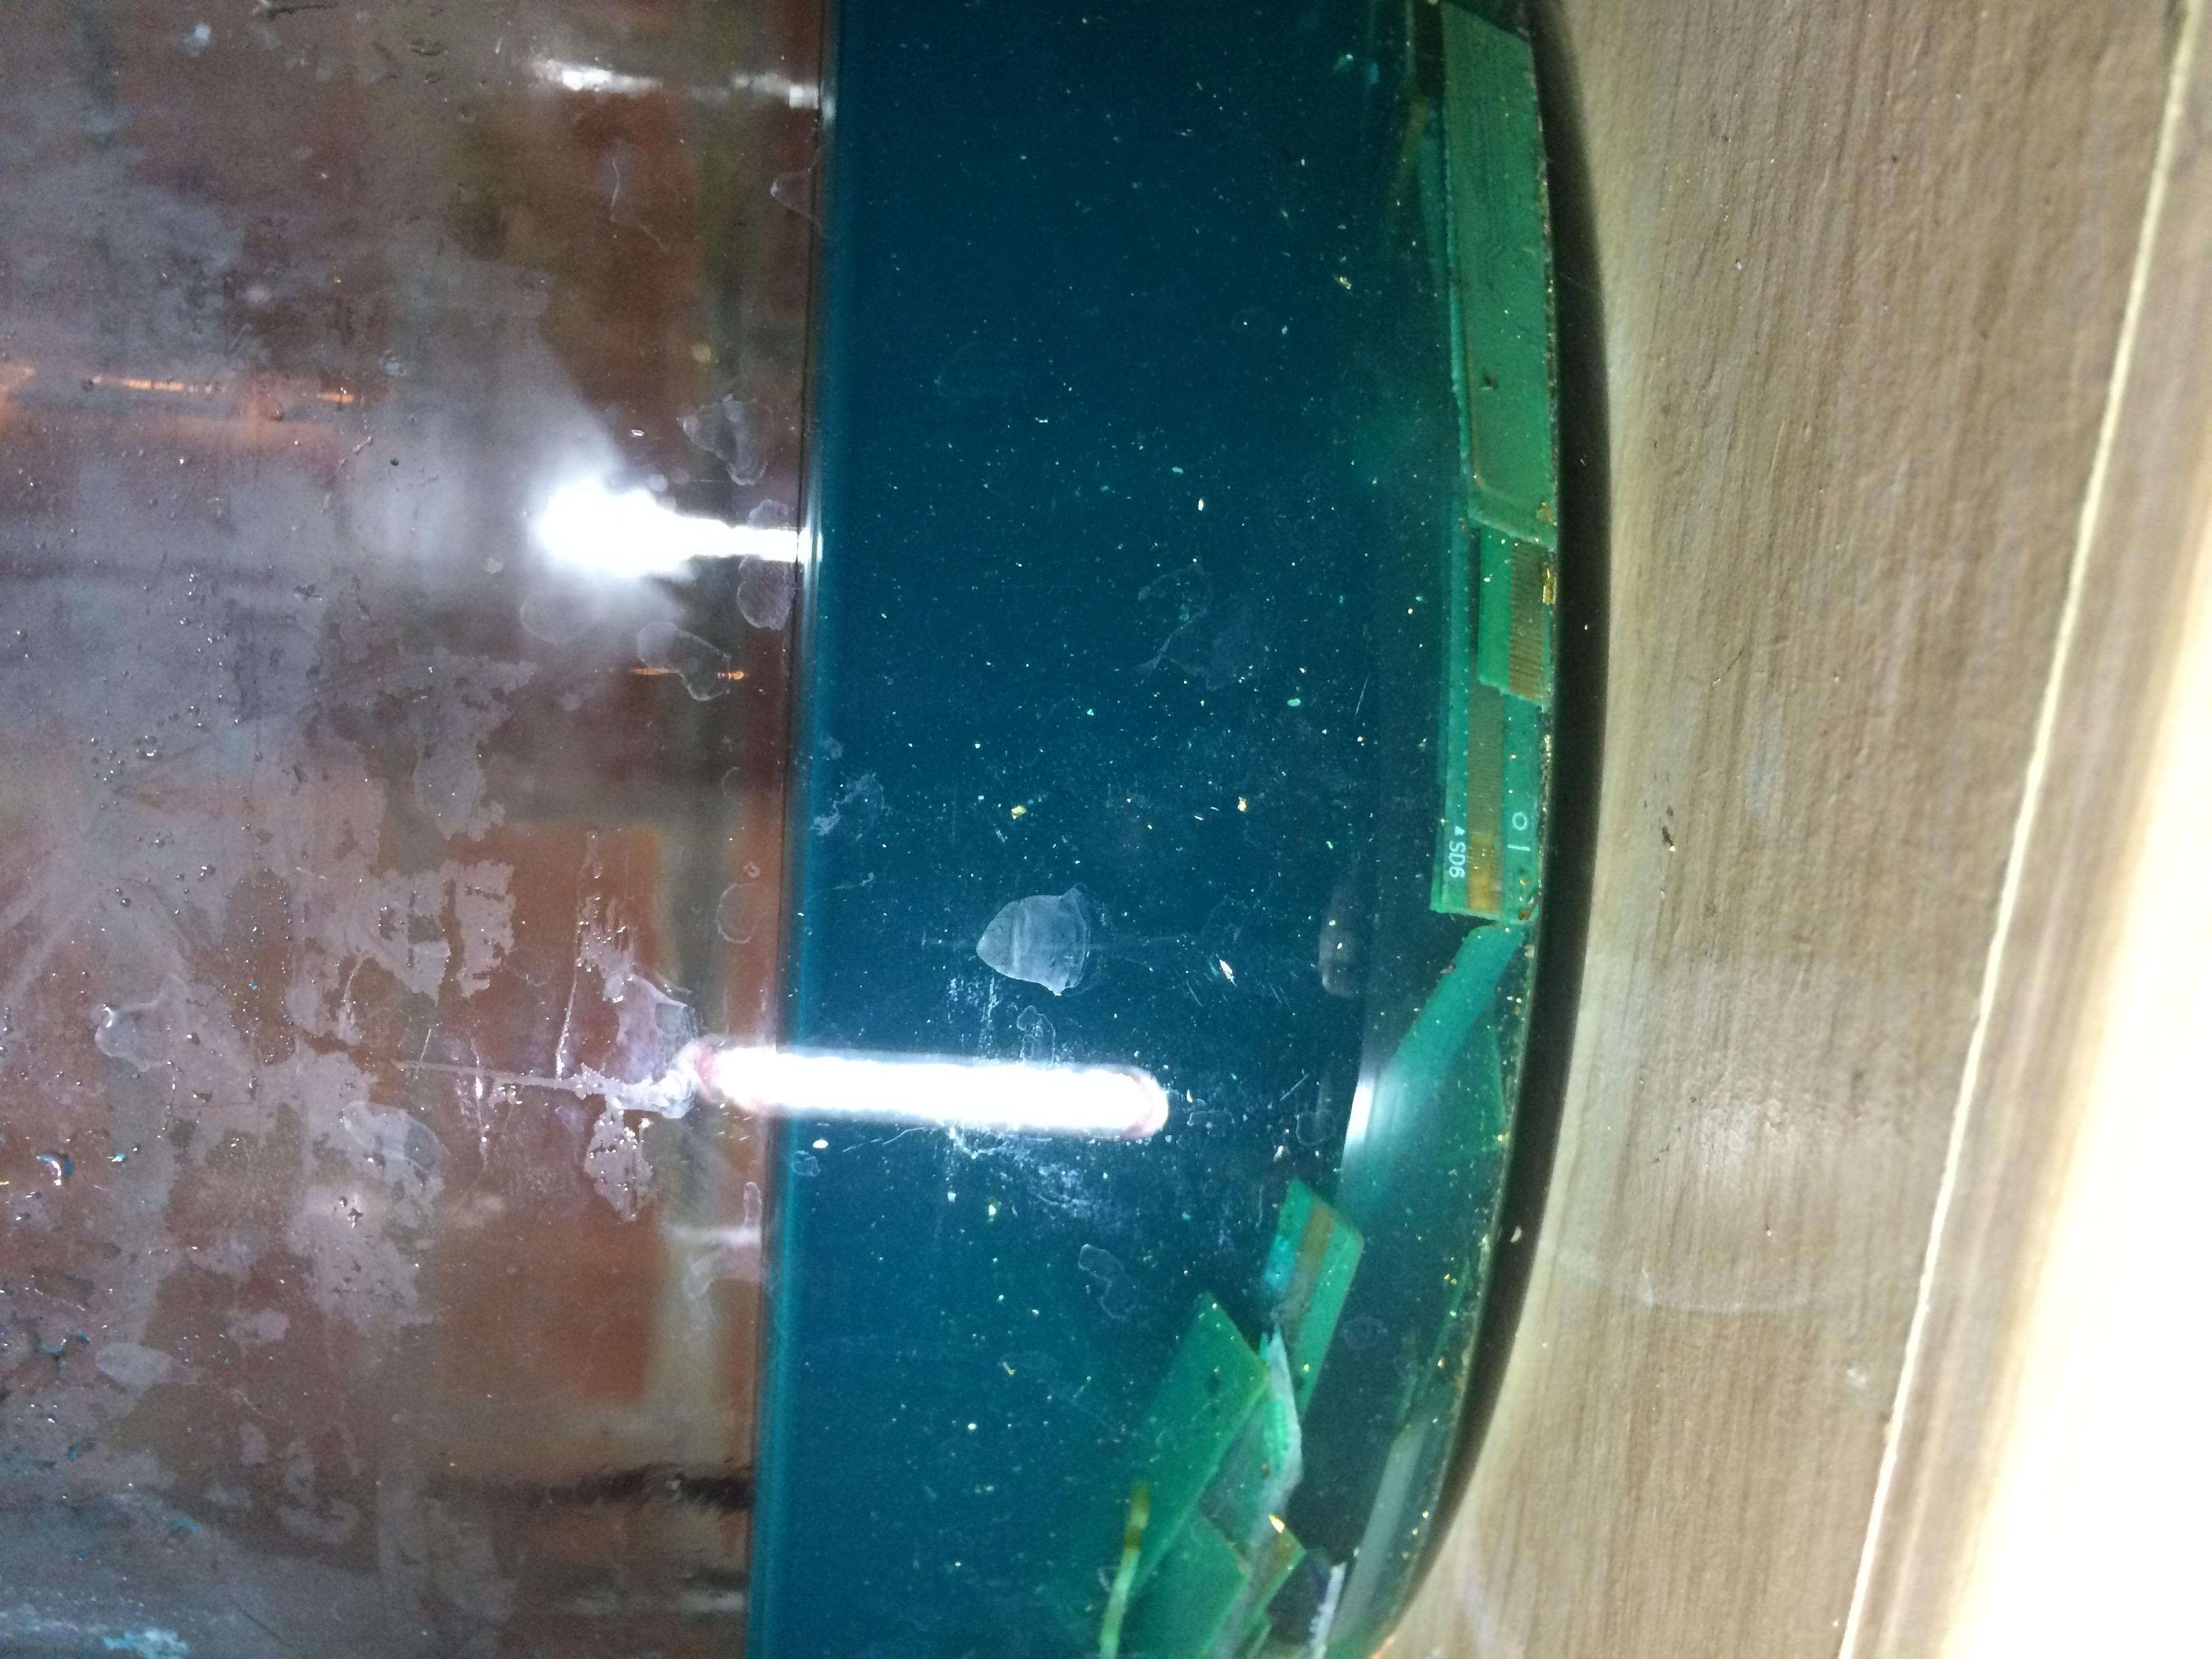 http://image.poubelles.be/D74Uuu7u-uou3-43Fu-B3ya-o4a4yyOBo334.jpeg